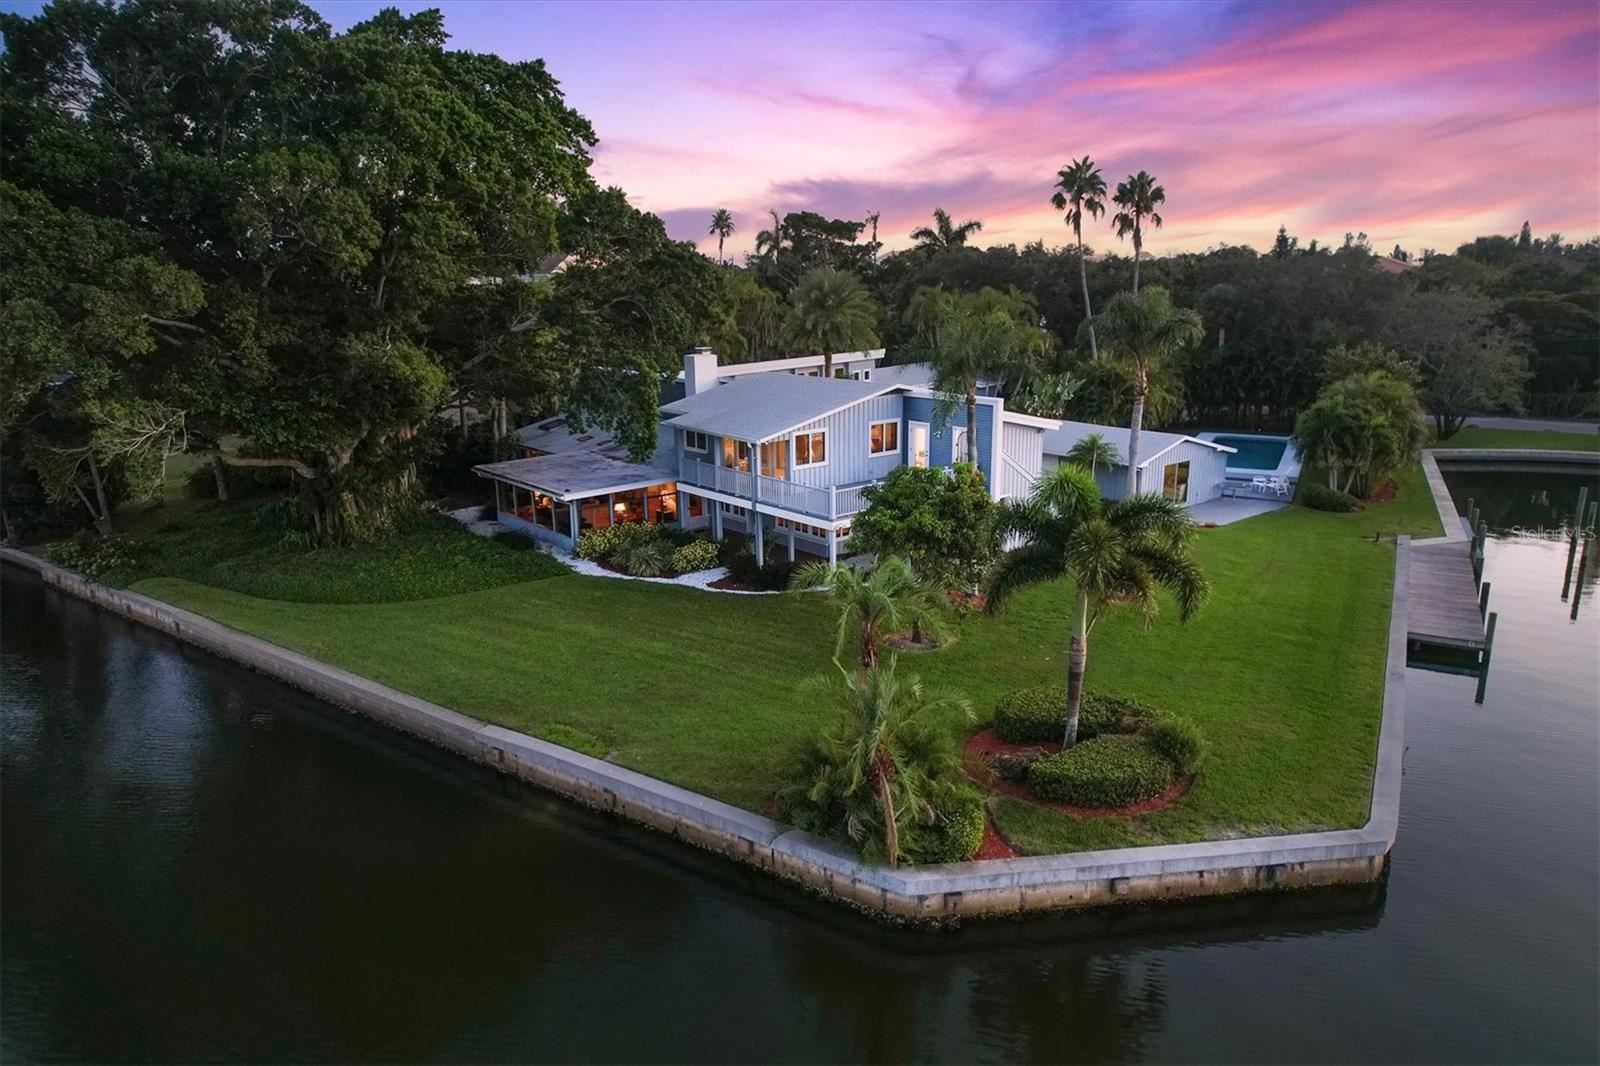 4089 ROBERTS POINT ROAD                                                                               Sarasota                                                                      , FL - $4,100,000